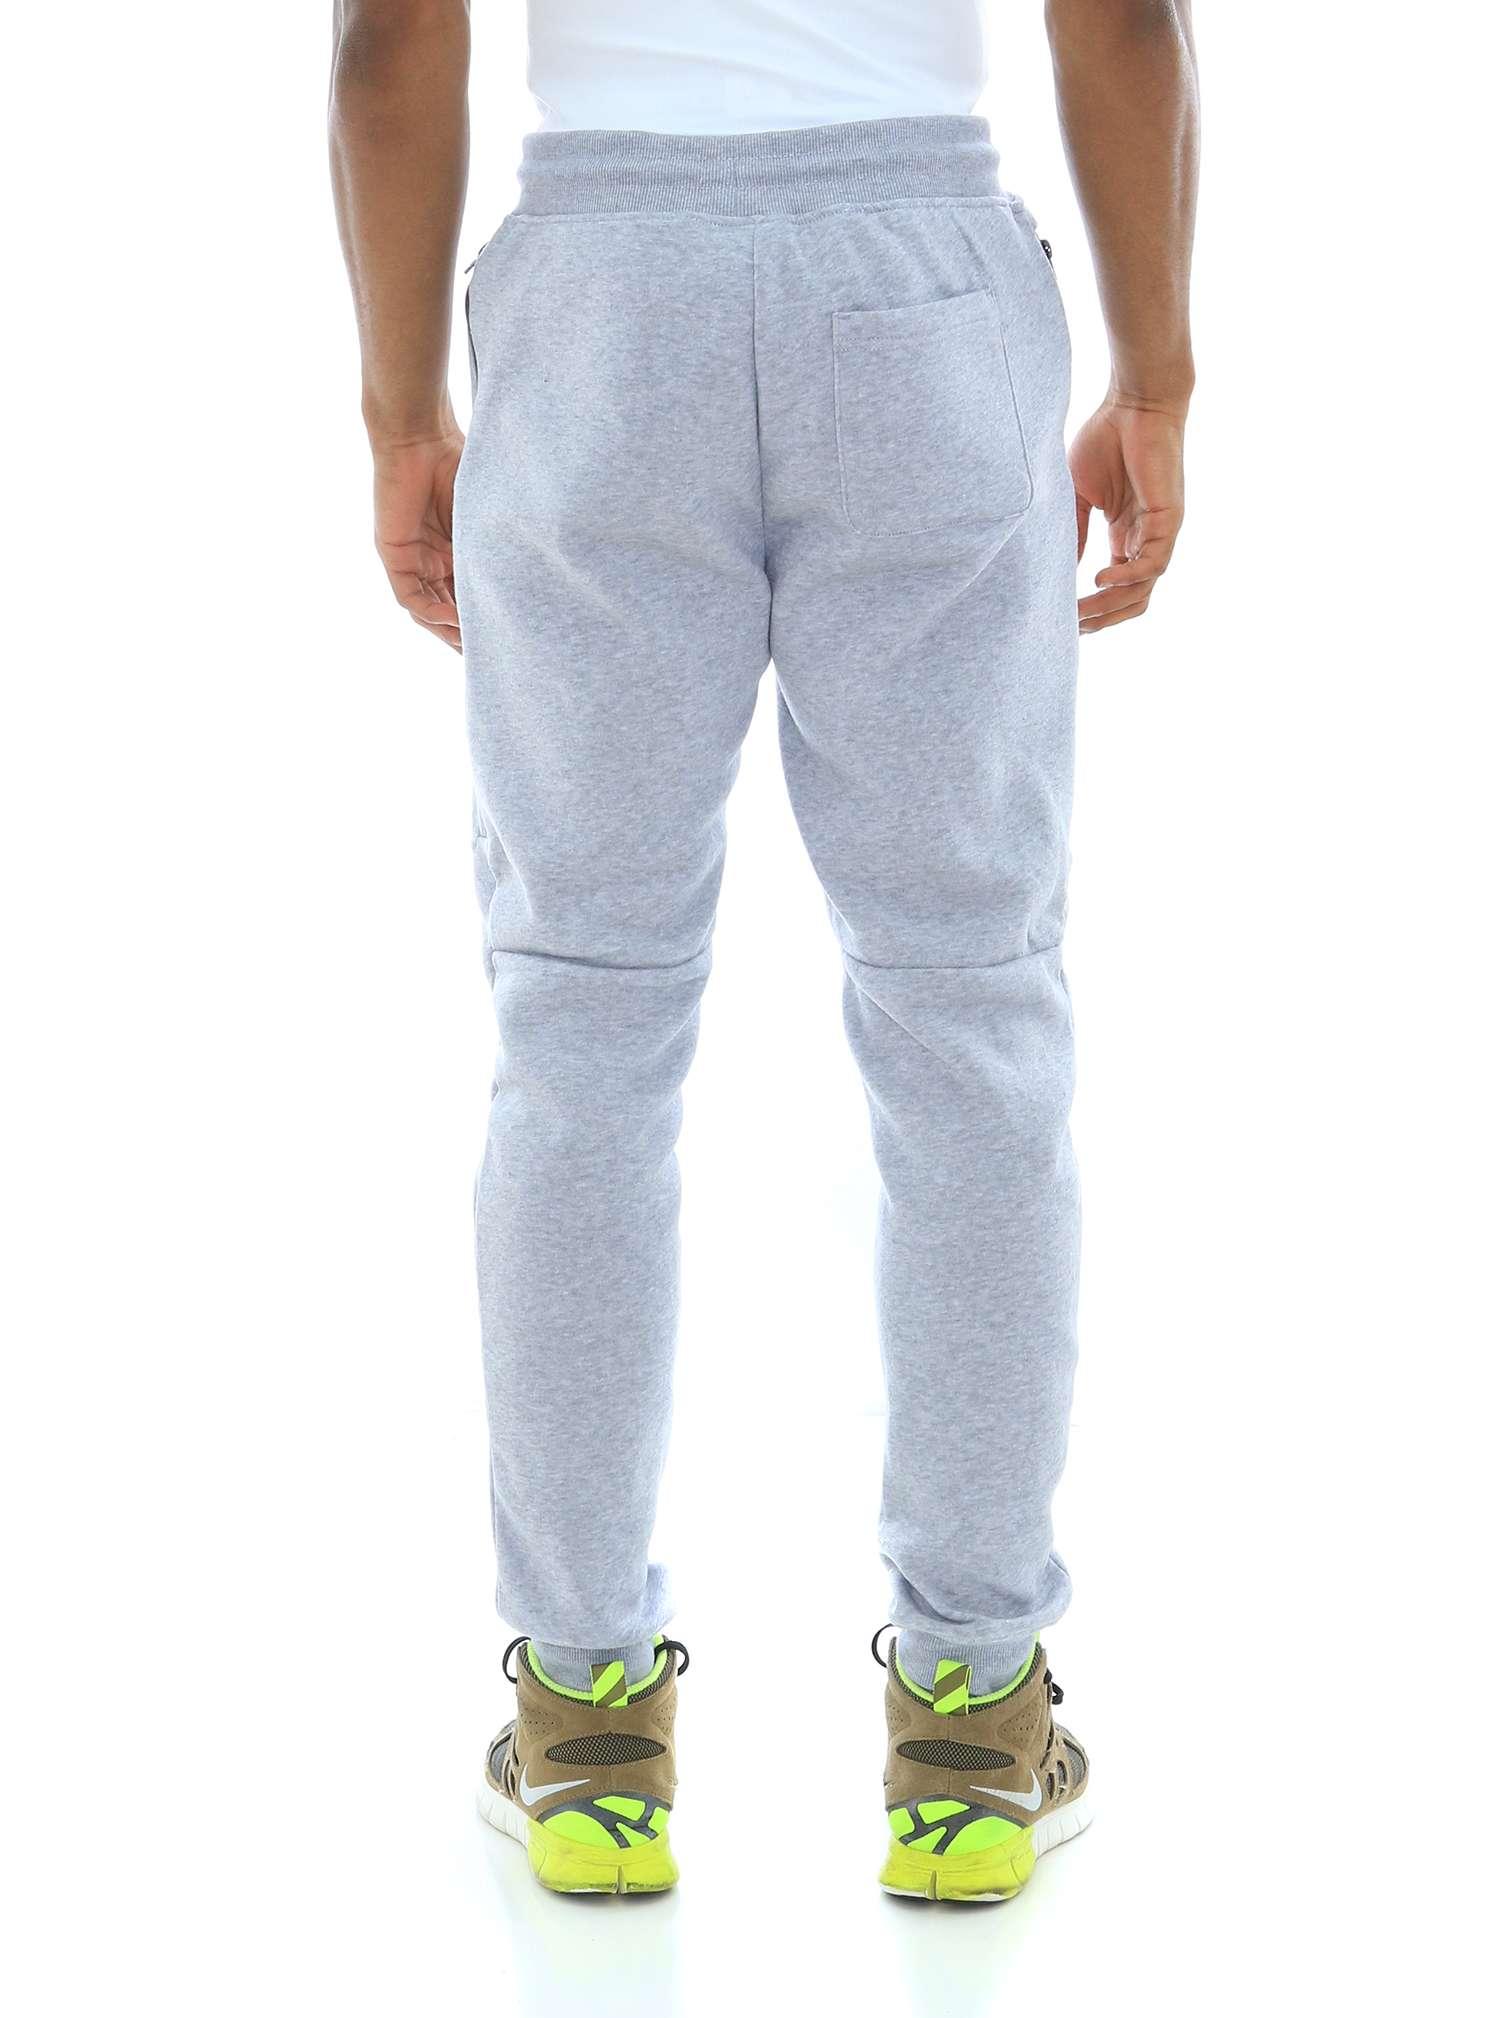 WT02-Men-039-s-Fleece-Jogger-Sweatpants-With-Bonded-Zippers thumbnail 10